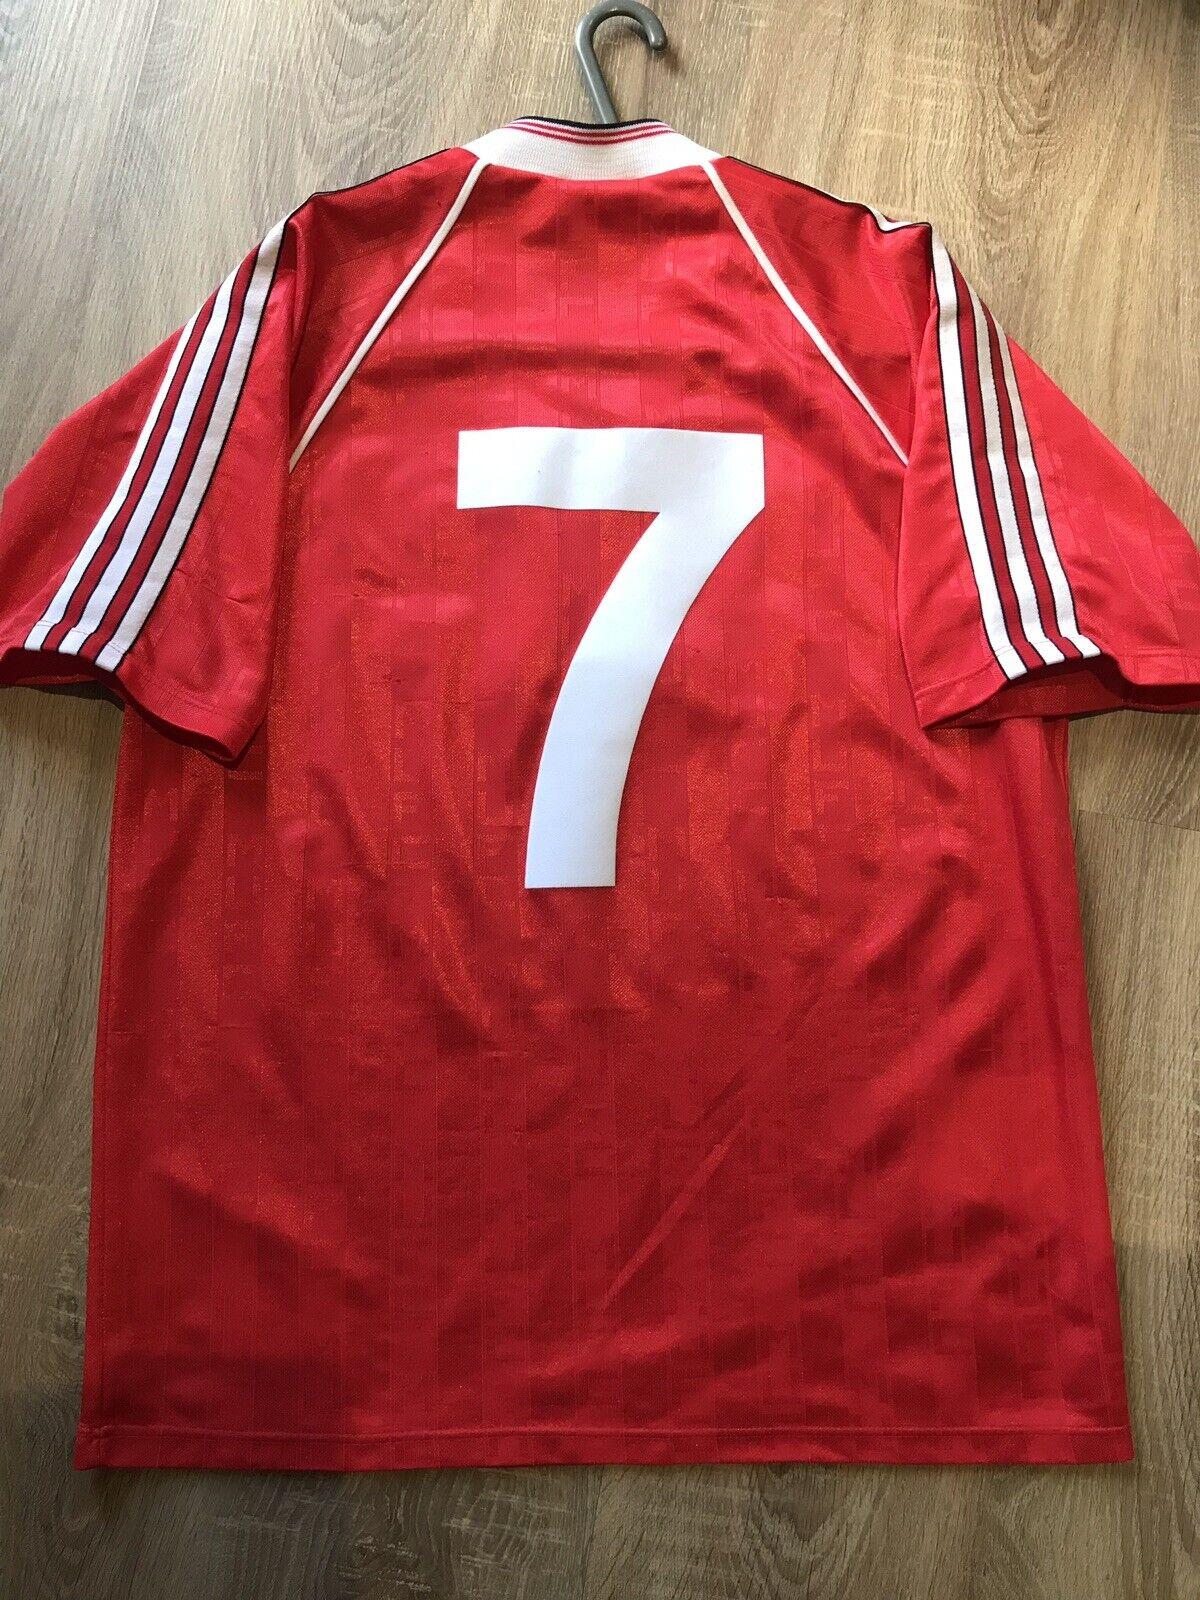 Manchester United Original Vintage 1988 90 Hogar Camiseta número 7 adultos (XL)